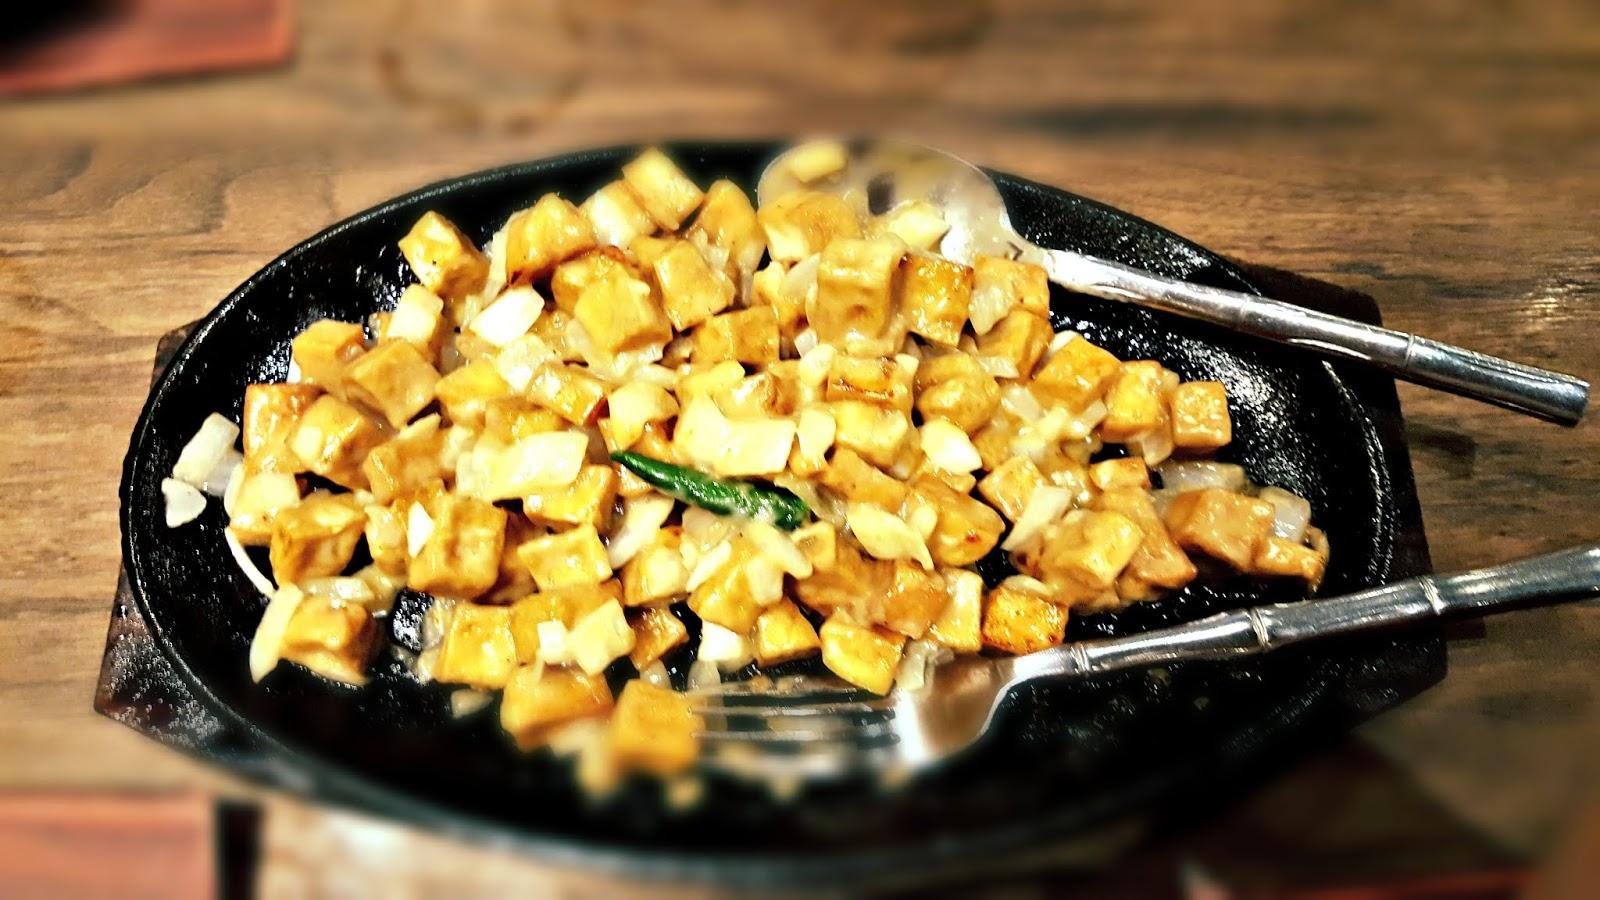 sizzling tofu mesa filipino moderne cuisine www.jeepneyrecipes.com